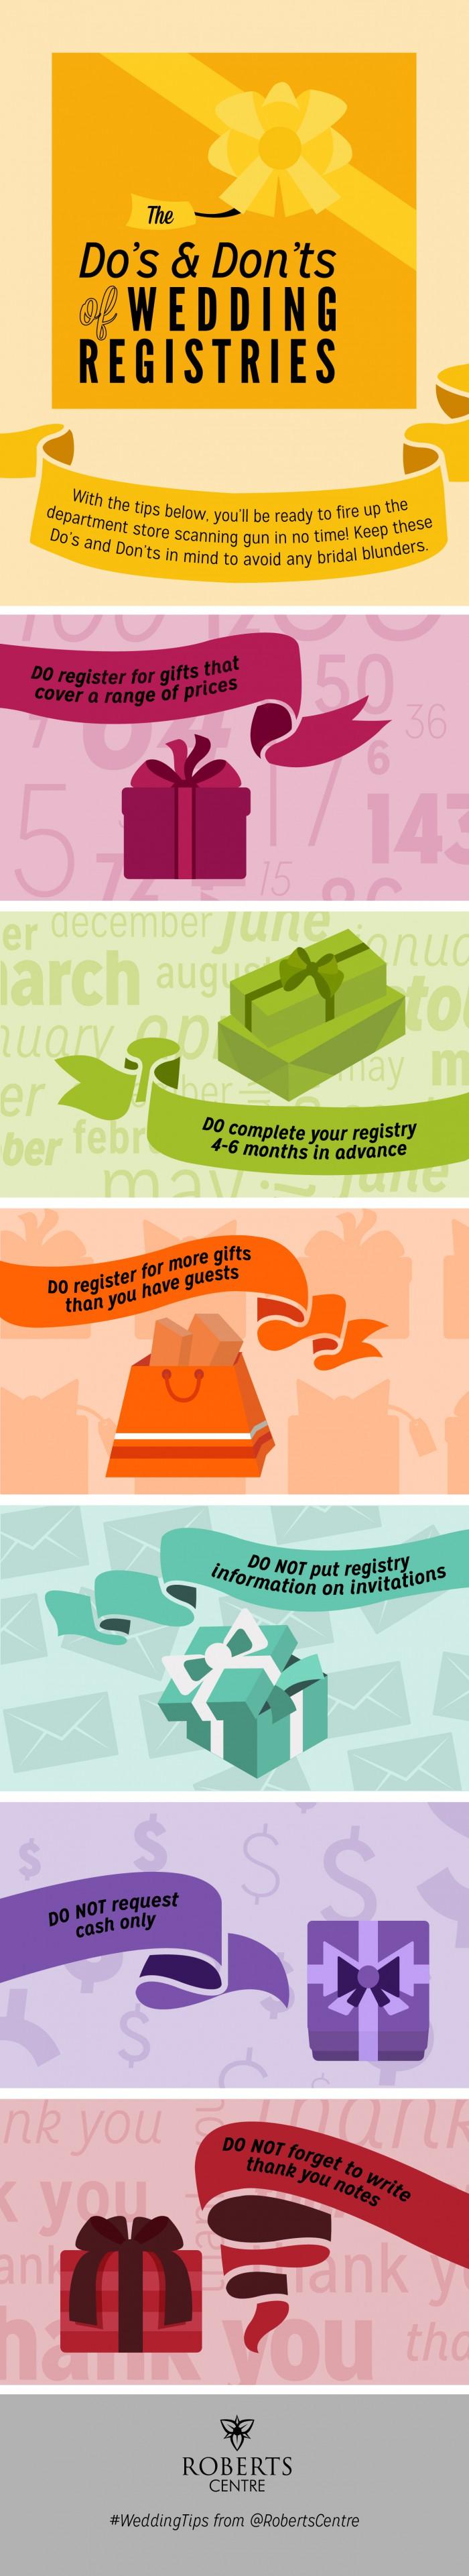 wedding registry etiquette 4 01